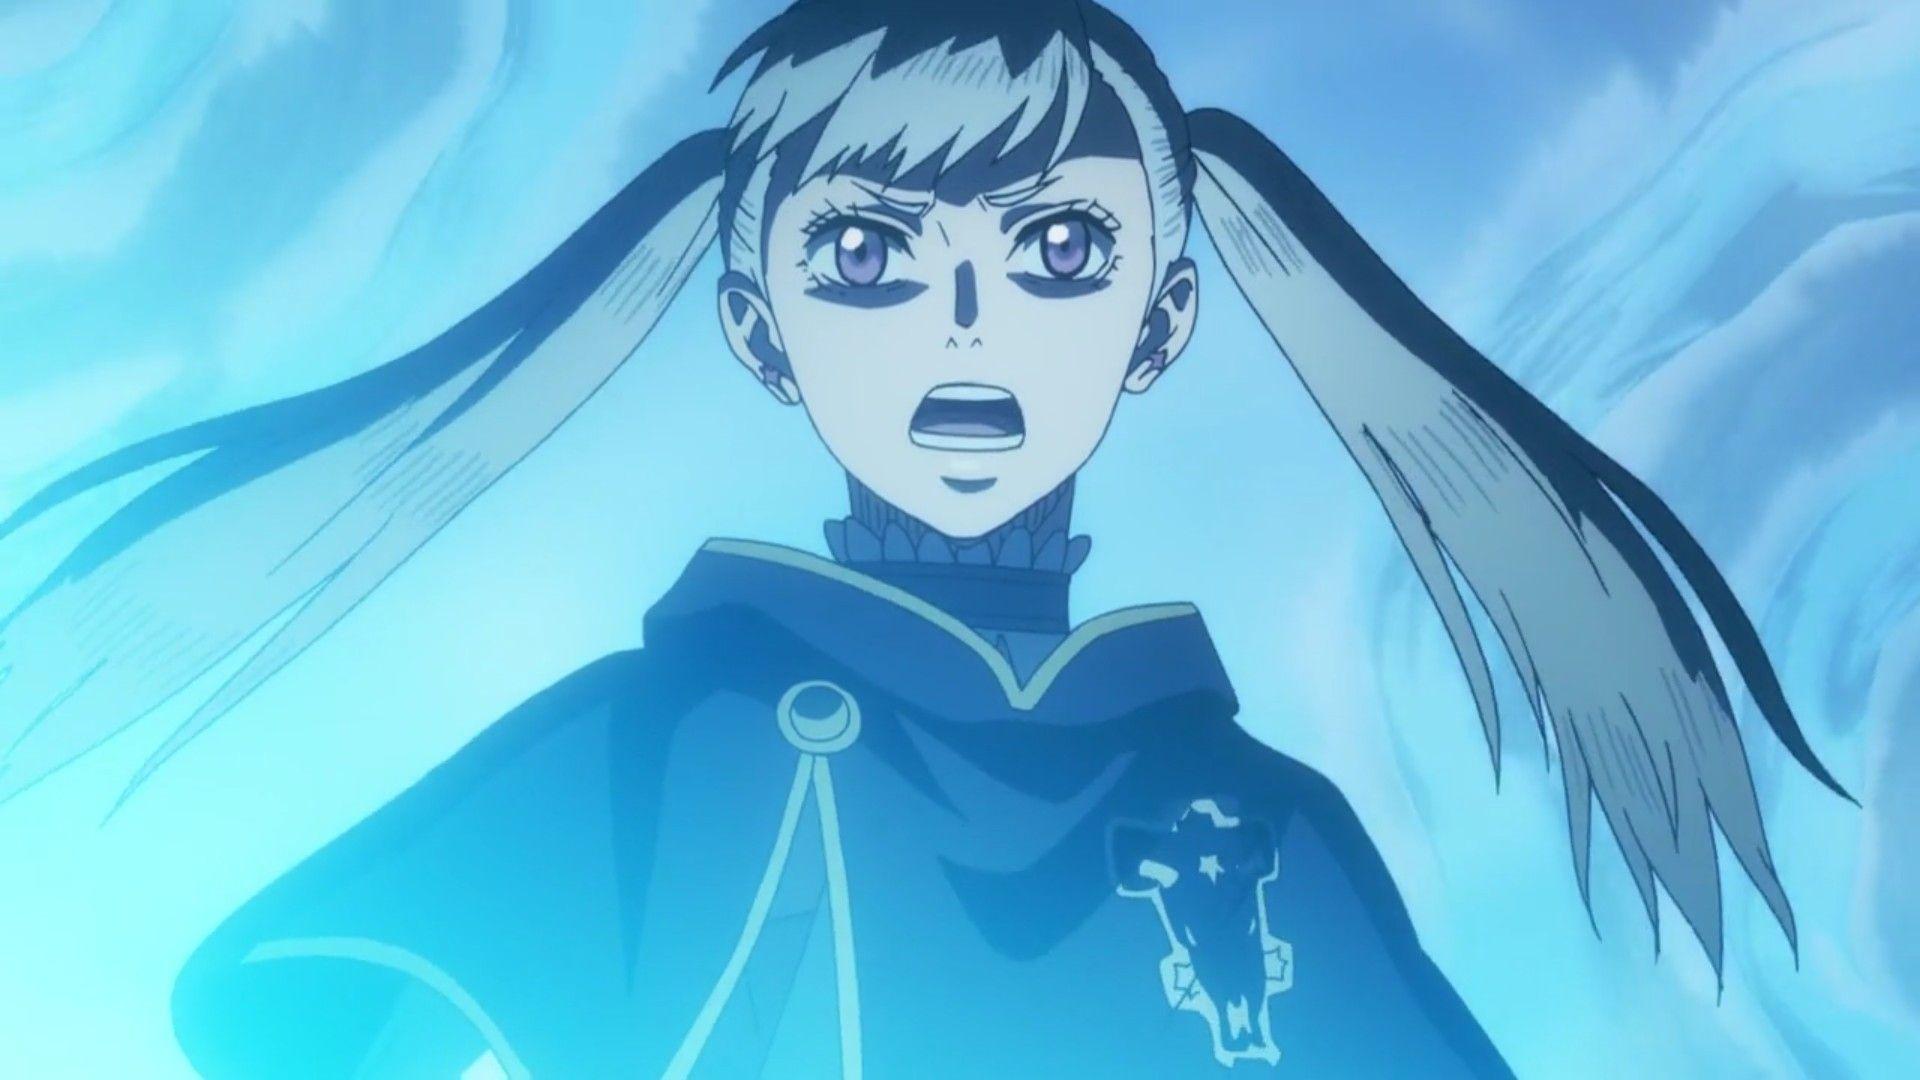 Pin de Luuh Saboya em Black Clover Anime, Manga, Fanart